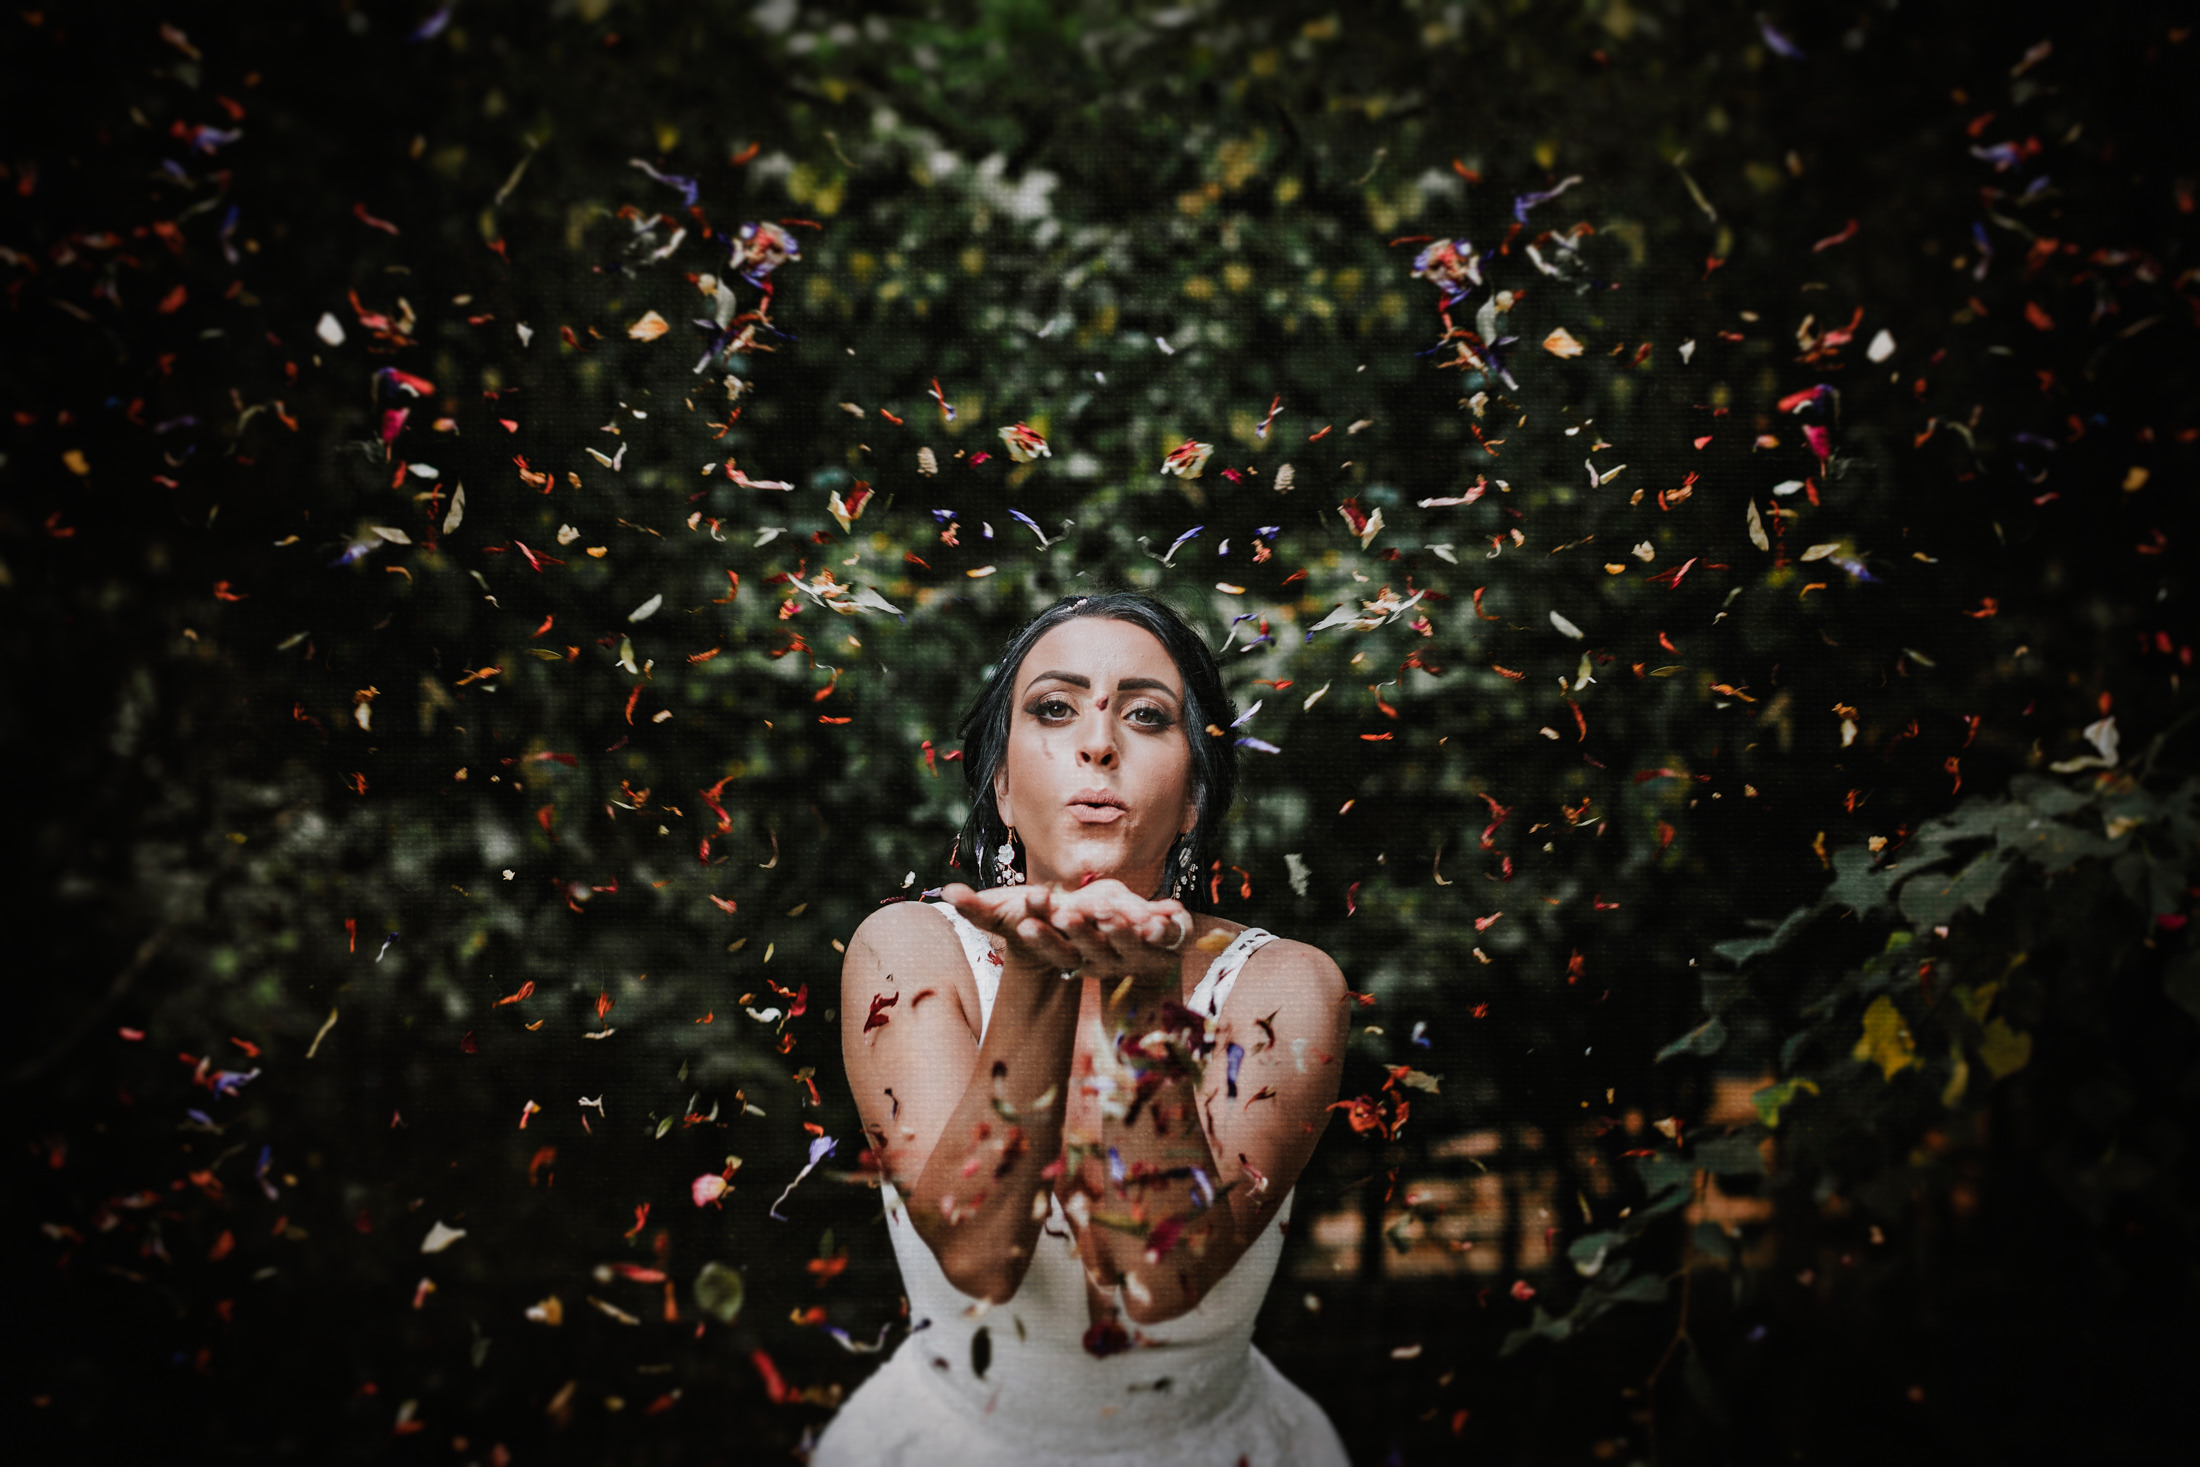 Woodland Wedding - nottingham outdoor wedding venue - east midlands wedding planner - bride with confetti